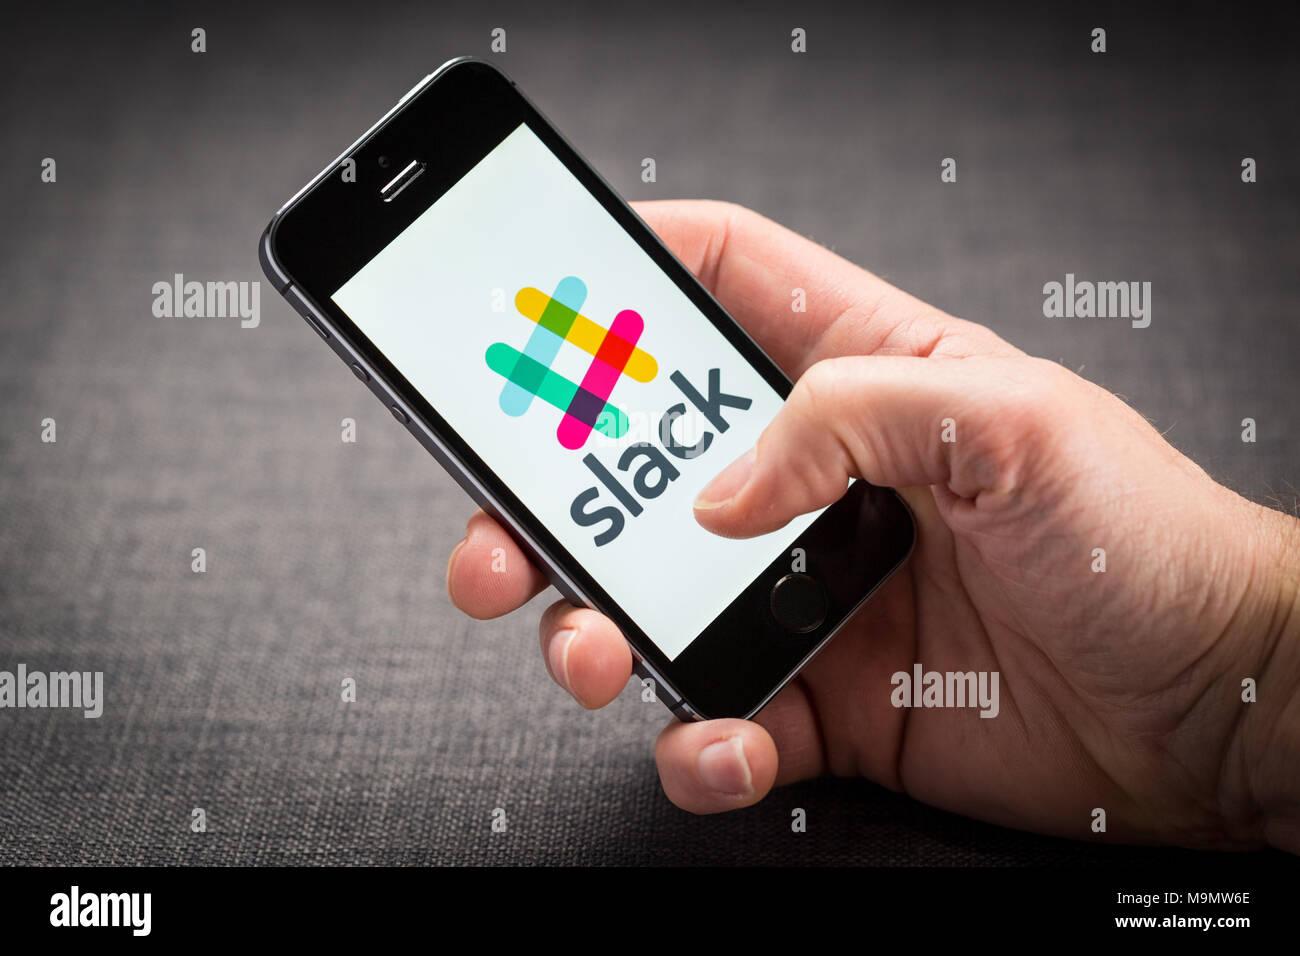 Slack app on an iPhone - Stock Image